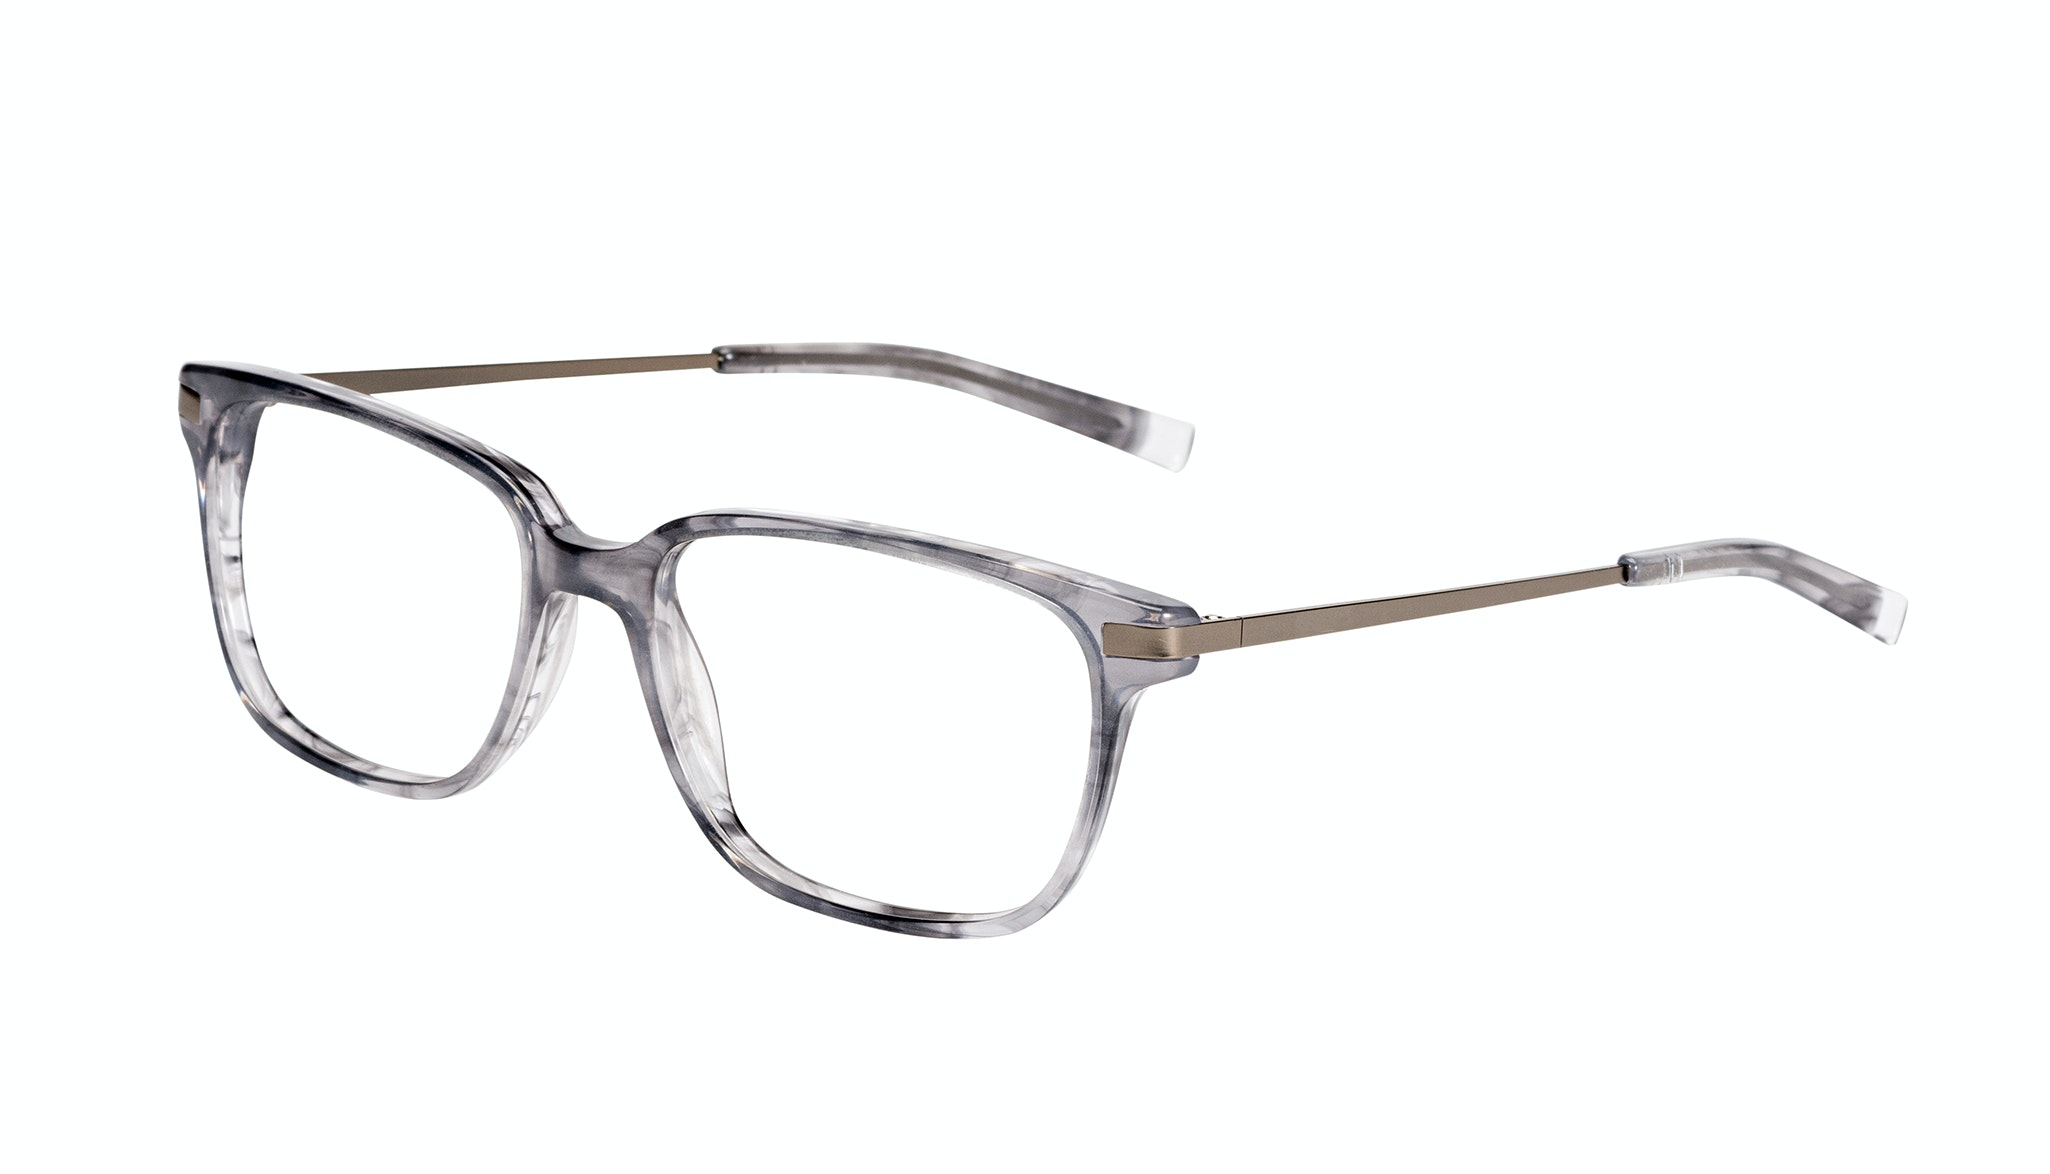 Affordable Fashion Glasses Rectangle Eyeglasses Men Trade Smokey Grey Tilt